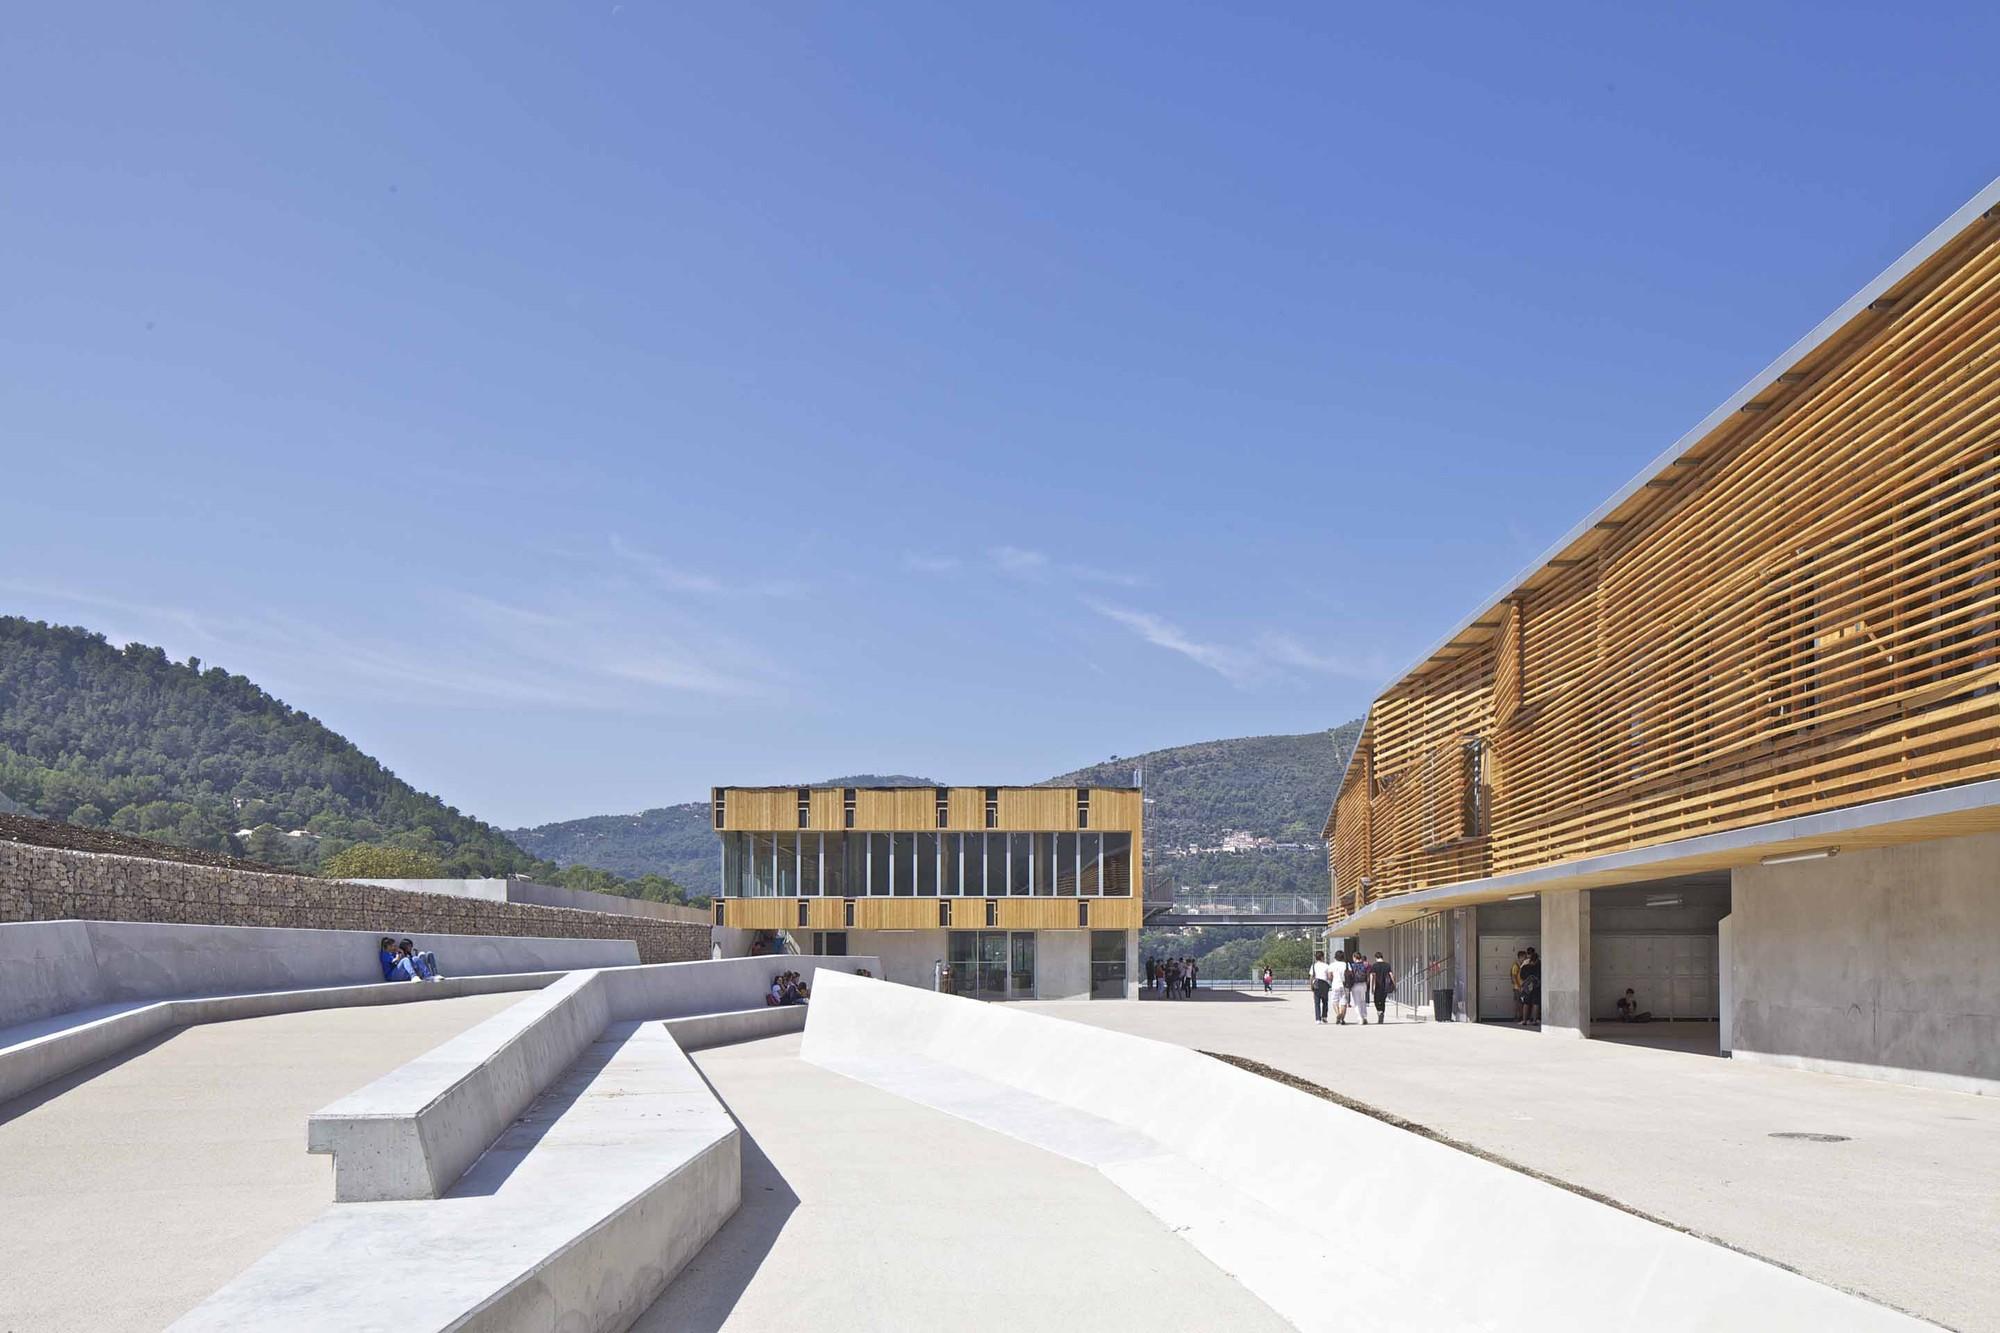 Lycée Régional René Goscinny / José Morales & Rémy Marciano, © Philippe Ruault